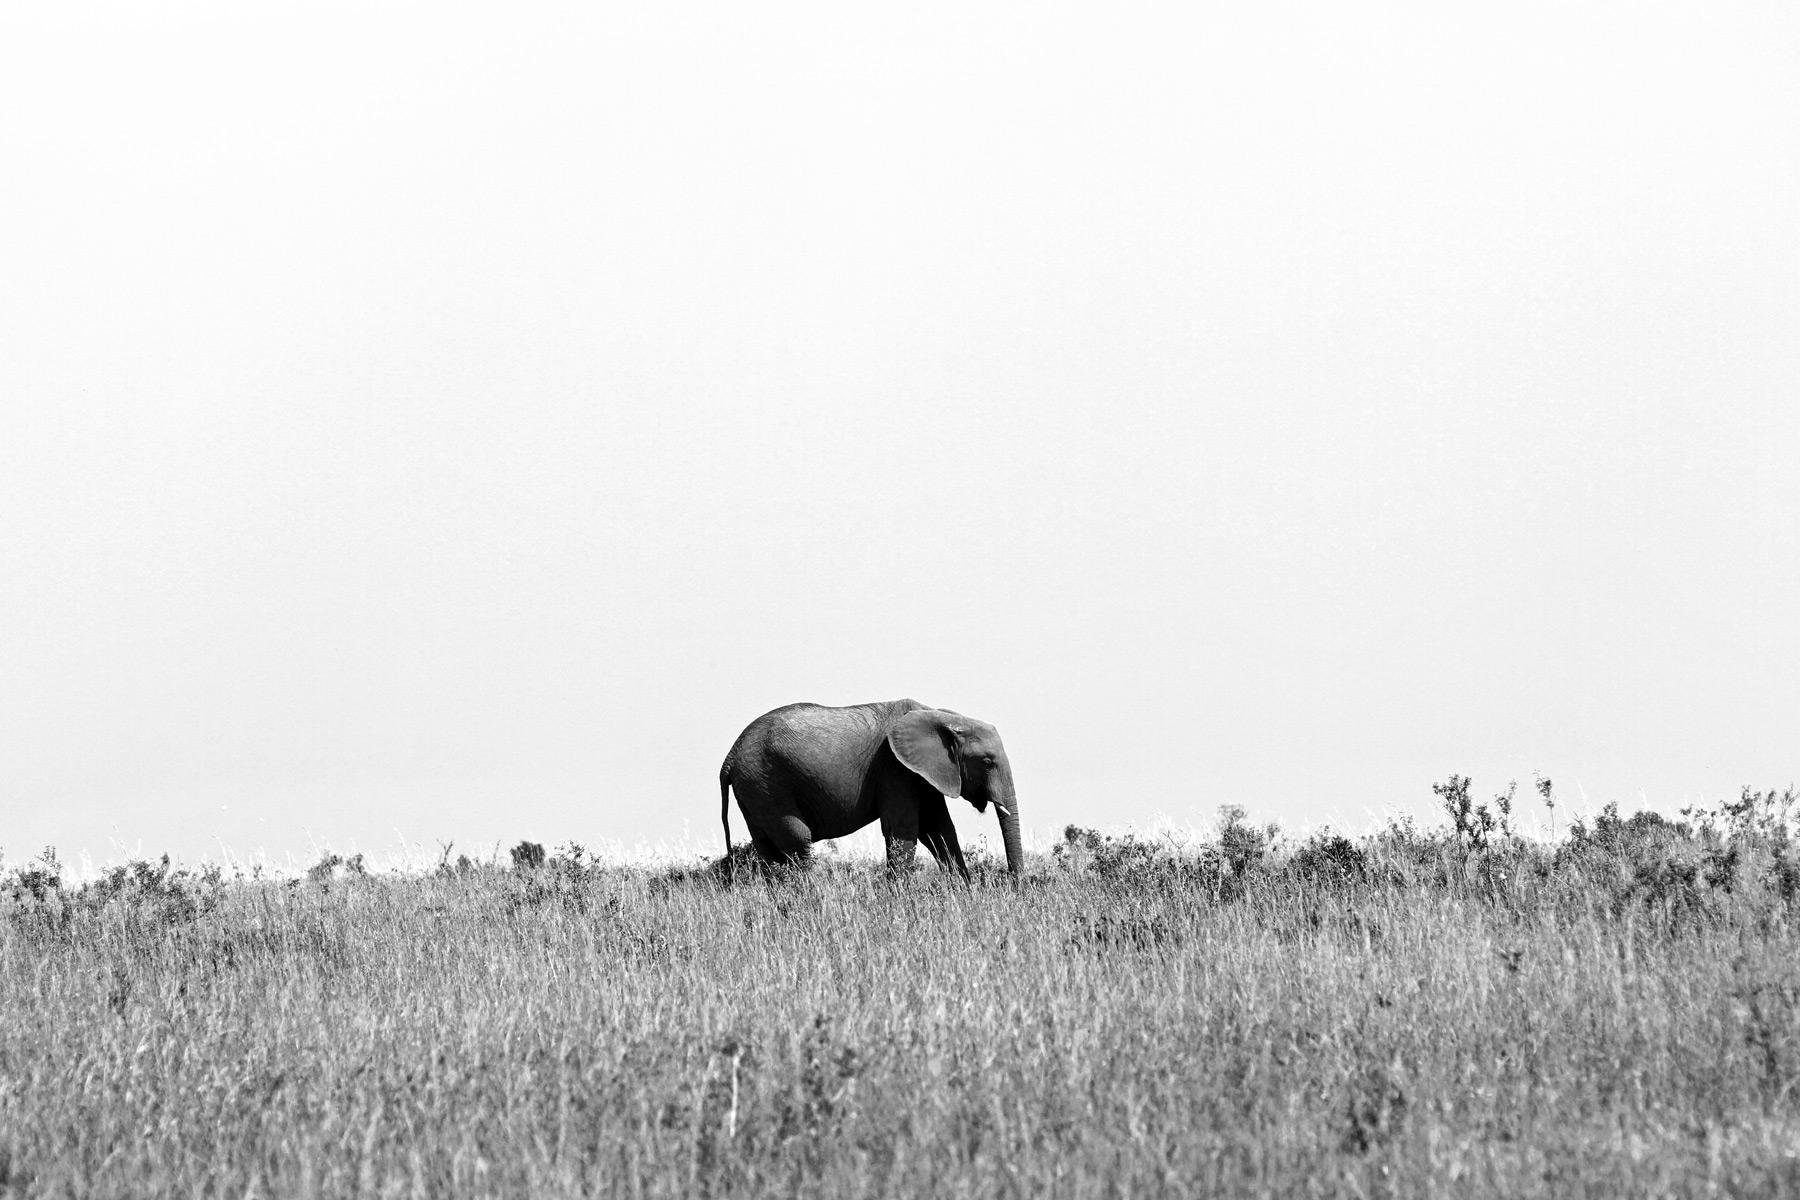 An African Elephant walking in the Maasai Mara National Park, Kenya